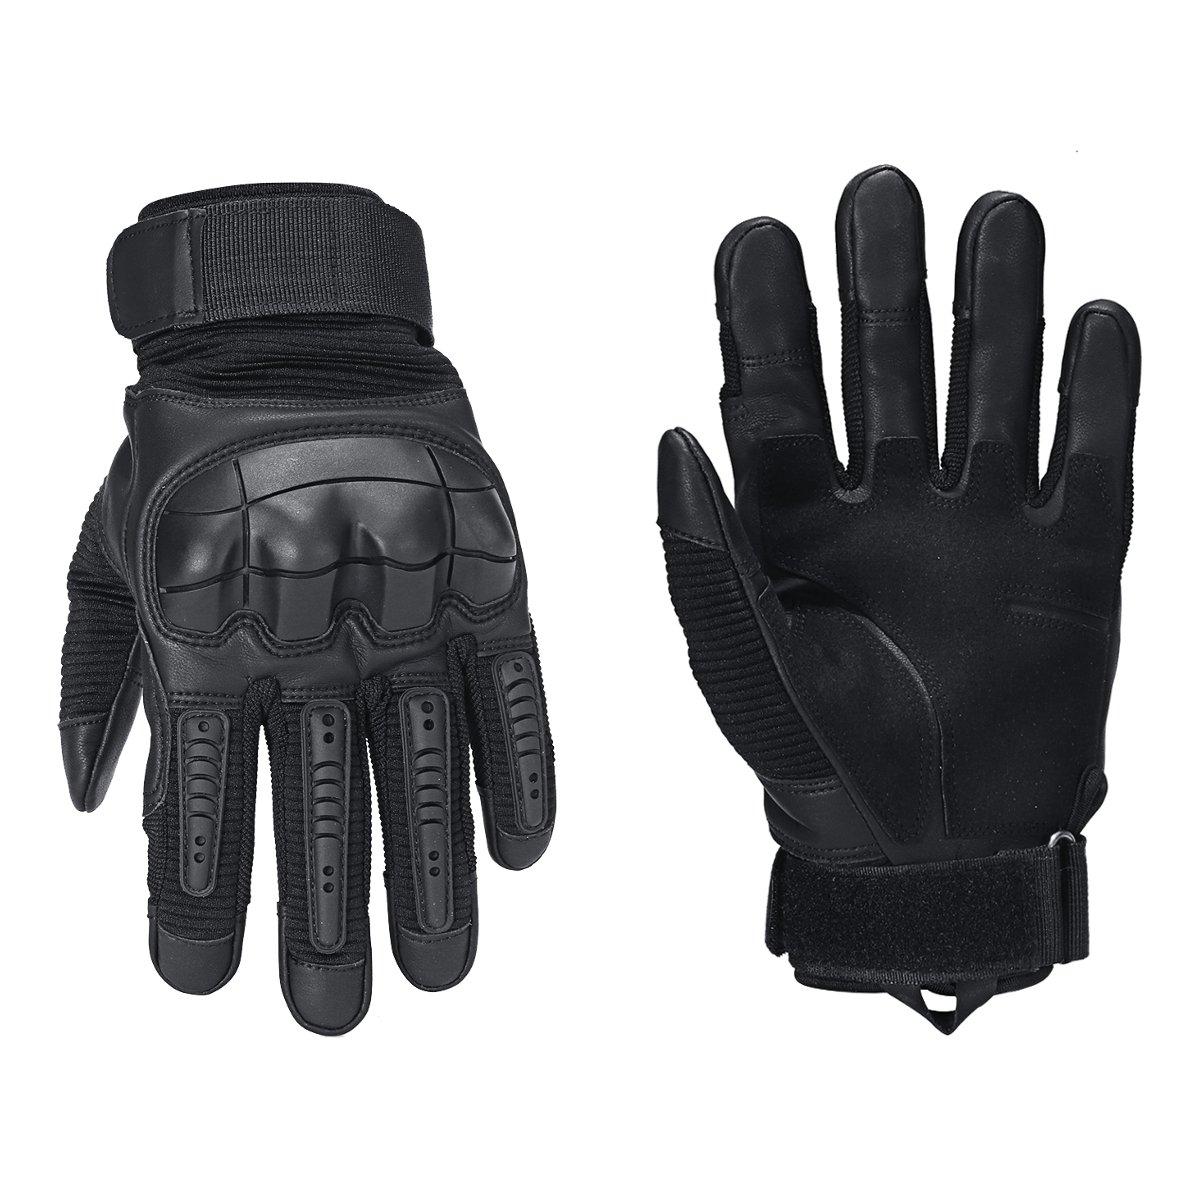 1 Pair Motorcycle Gloves Microfiber Rubber Unisex Full Finger Glove Winter Outdoor Sport Warm Glove Motocross Protective Gloves